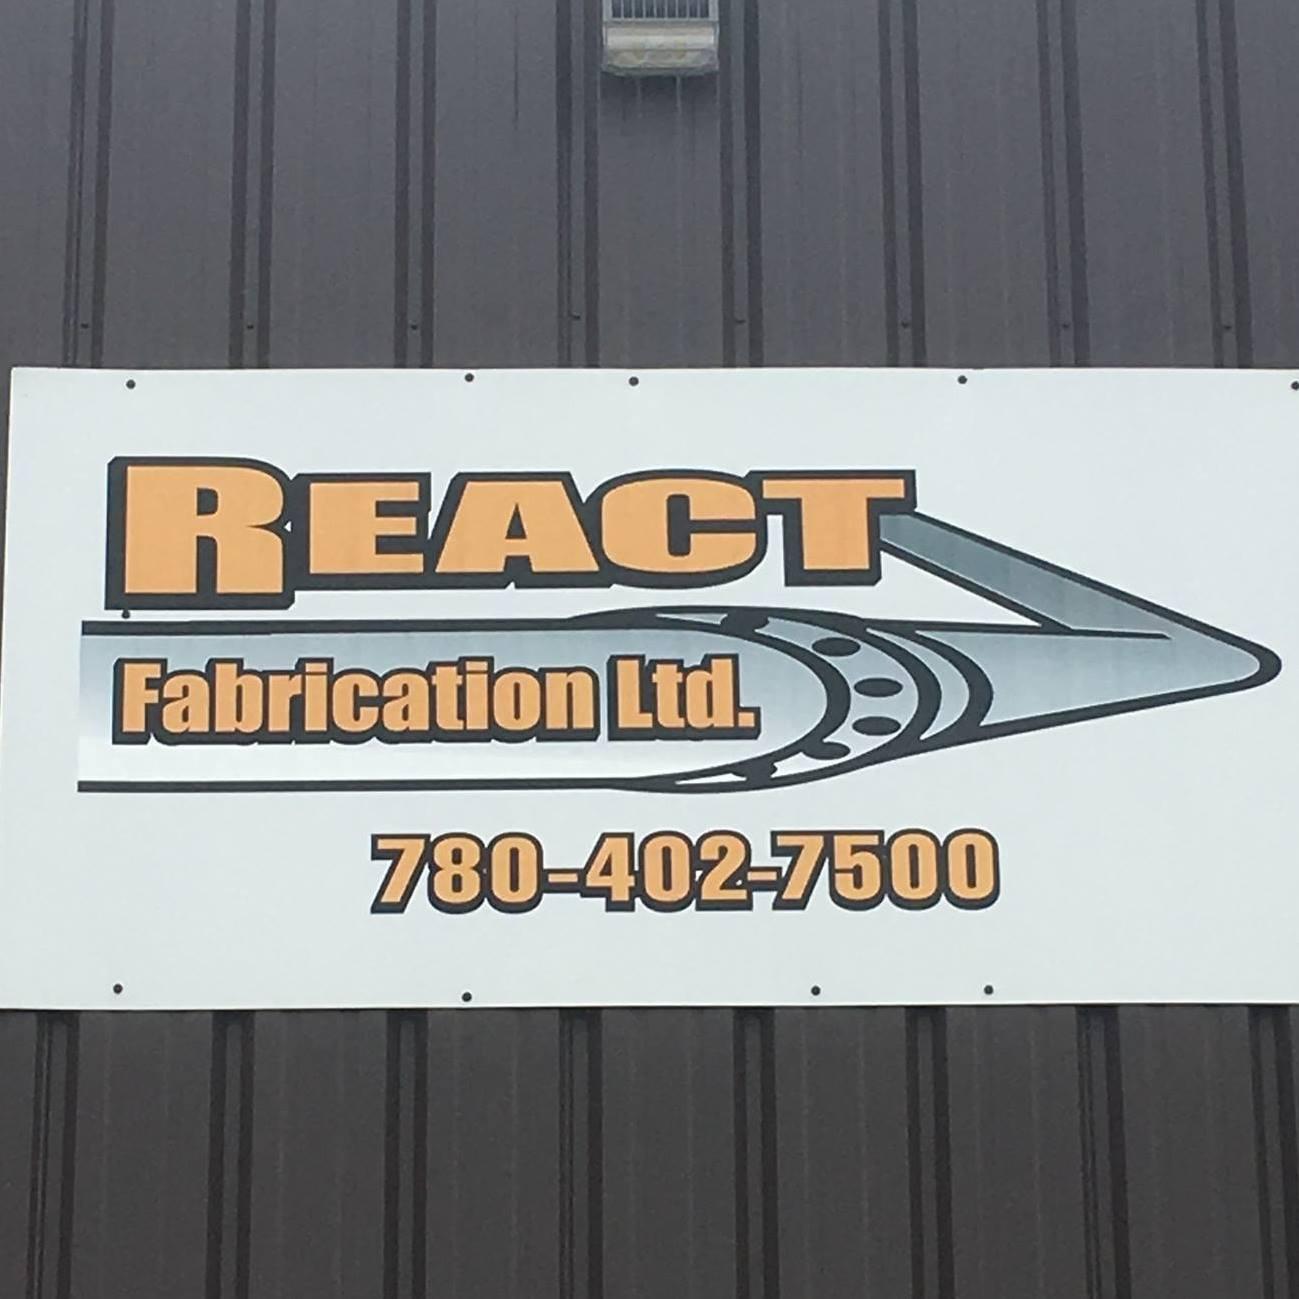 React Fabrication Ltd logo